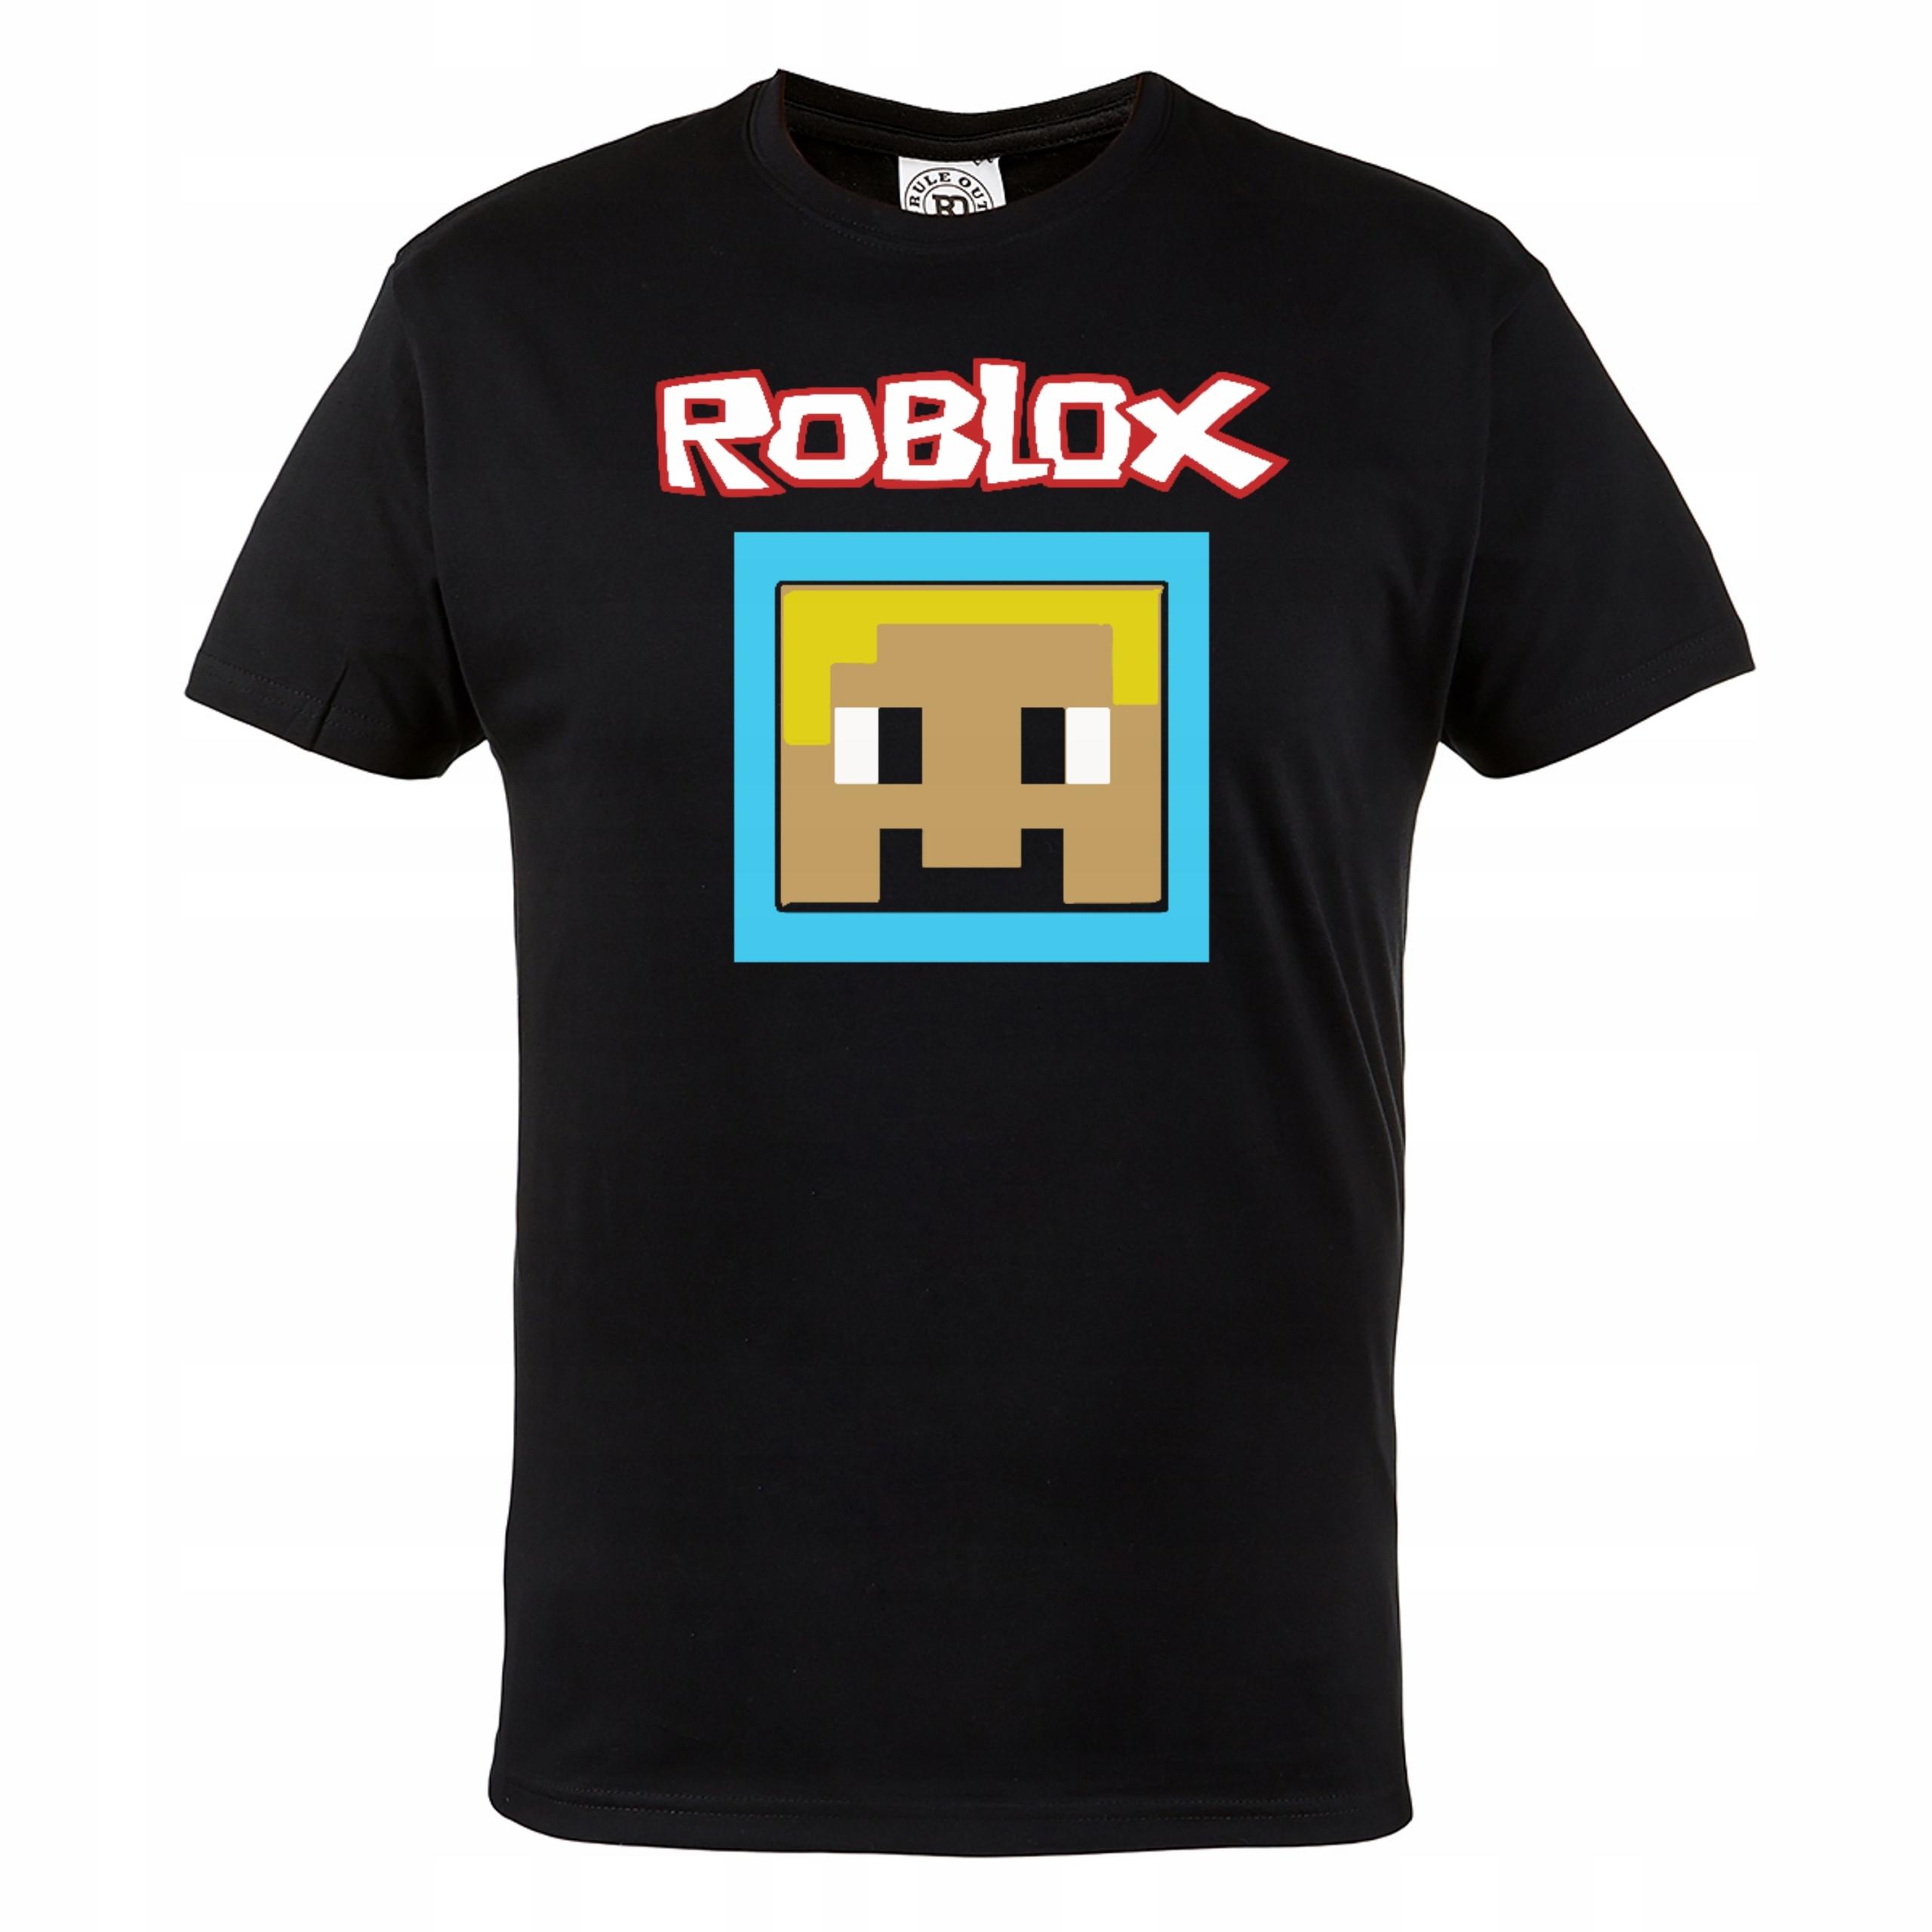 Nike roblox shirts Roblox